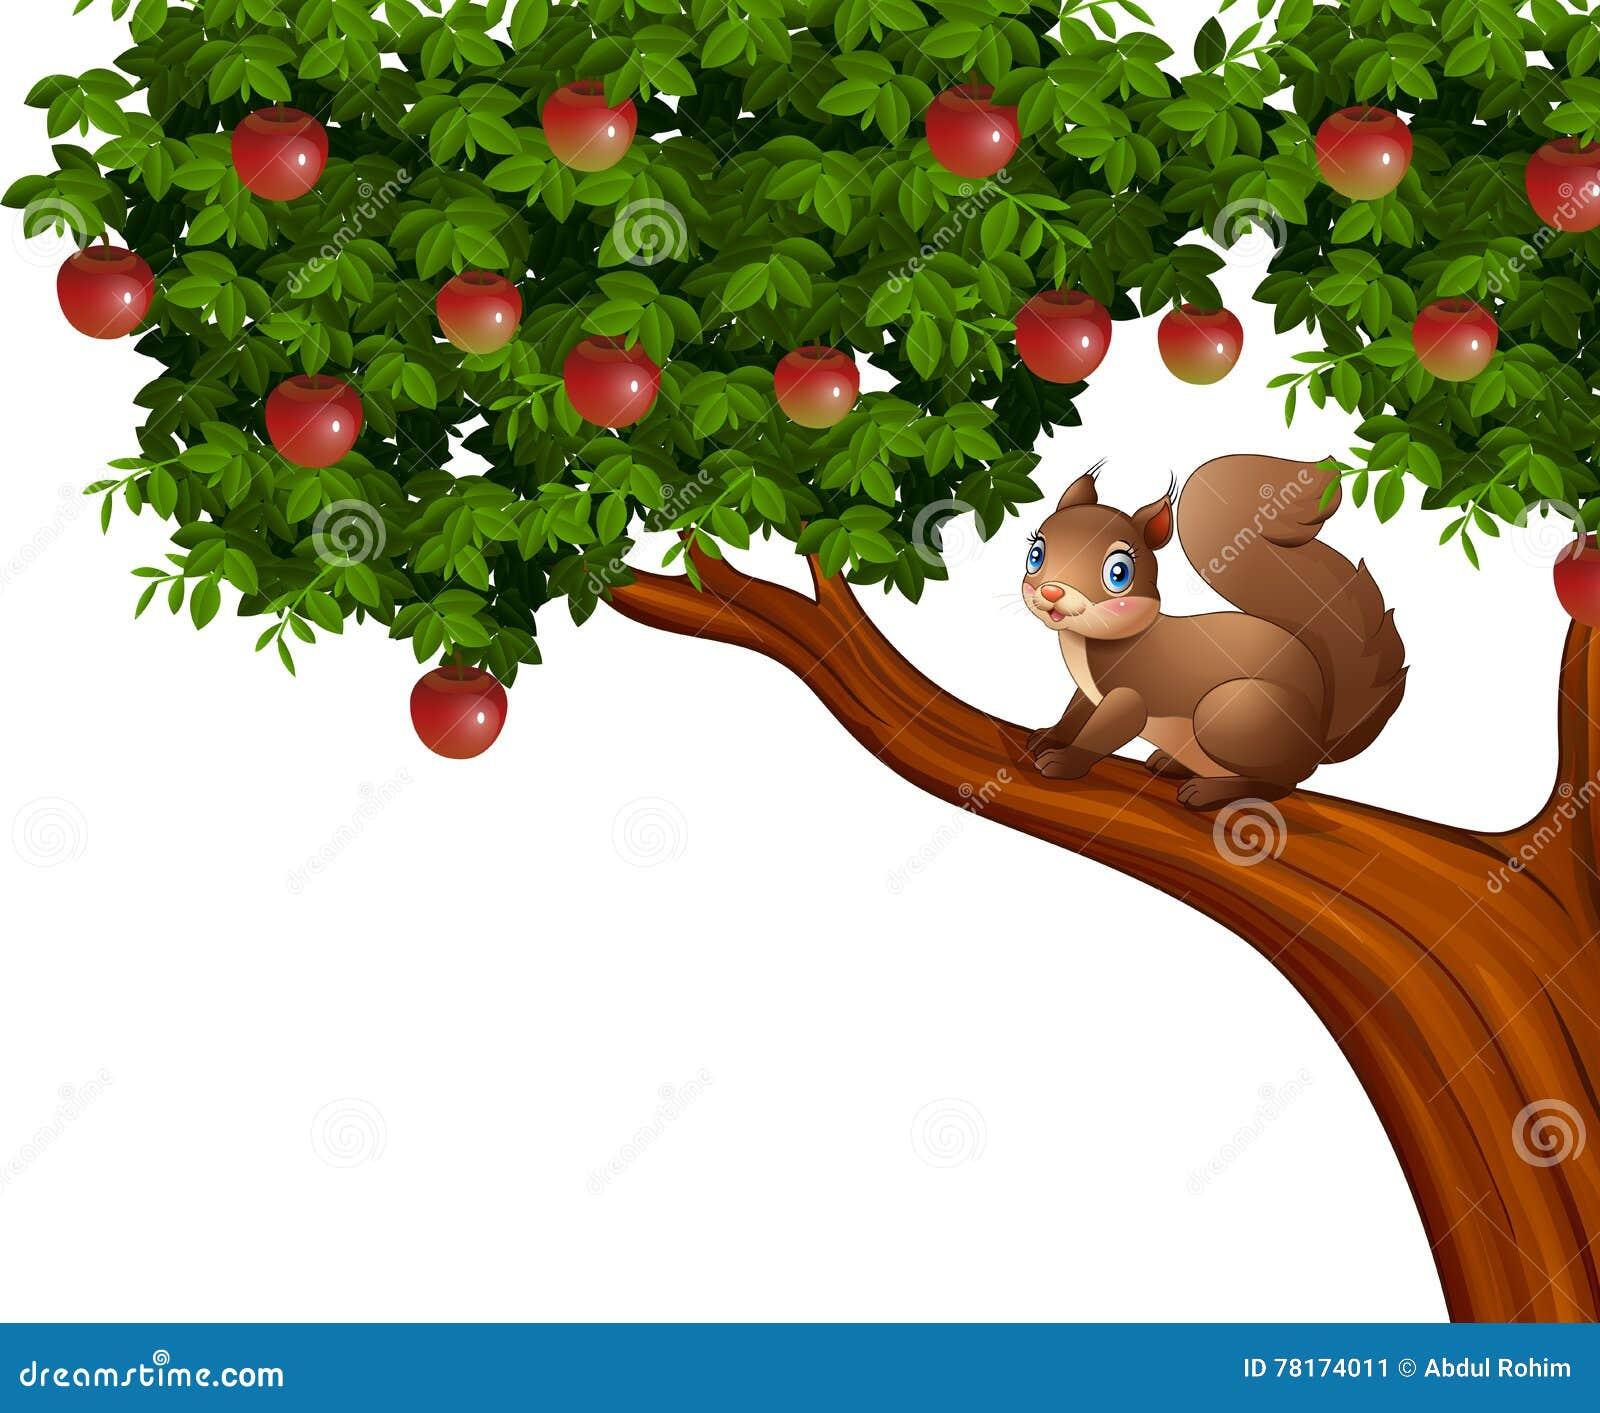 Cartoon Squirrel On Apple Tree Stock Vector - Illustration of nature ...